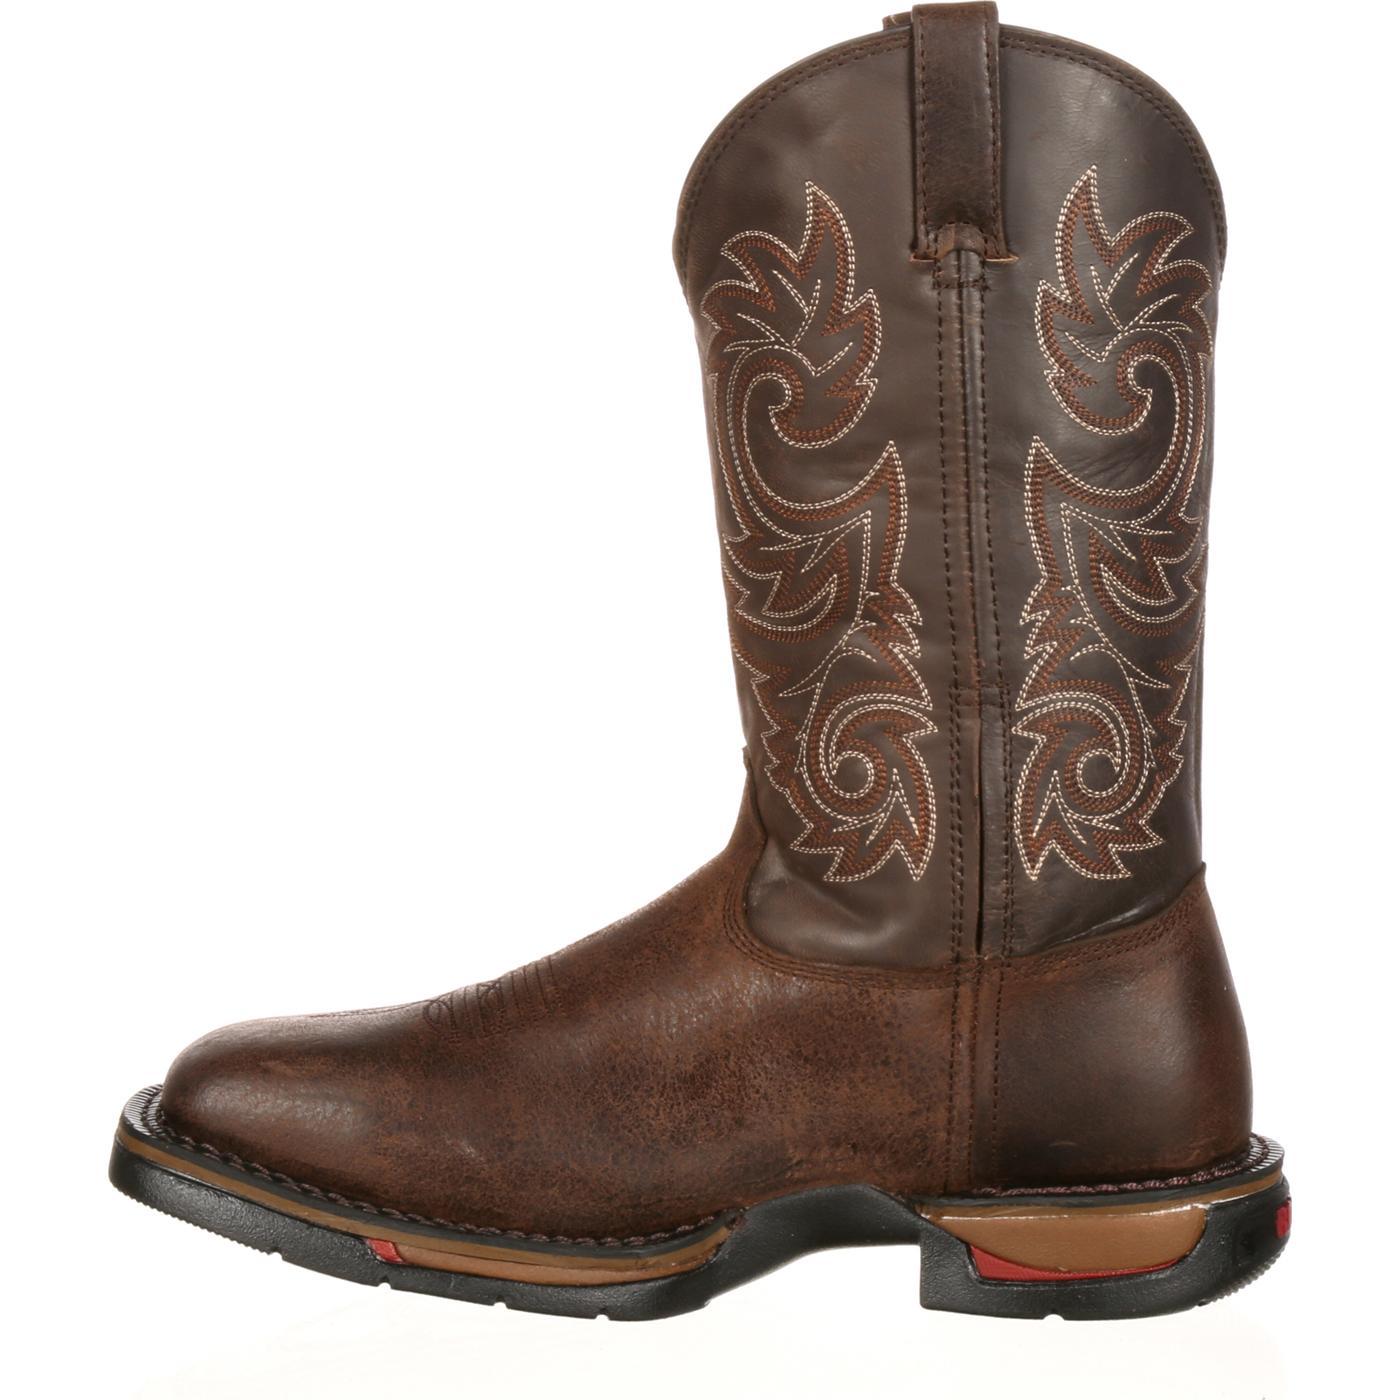 Rocky Long Range - Men's Comfortable Western Work Boots